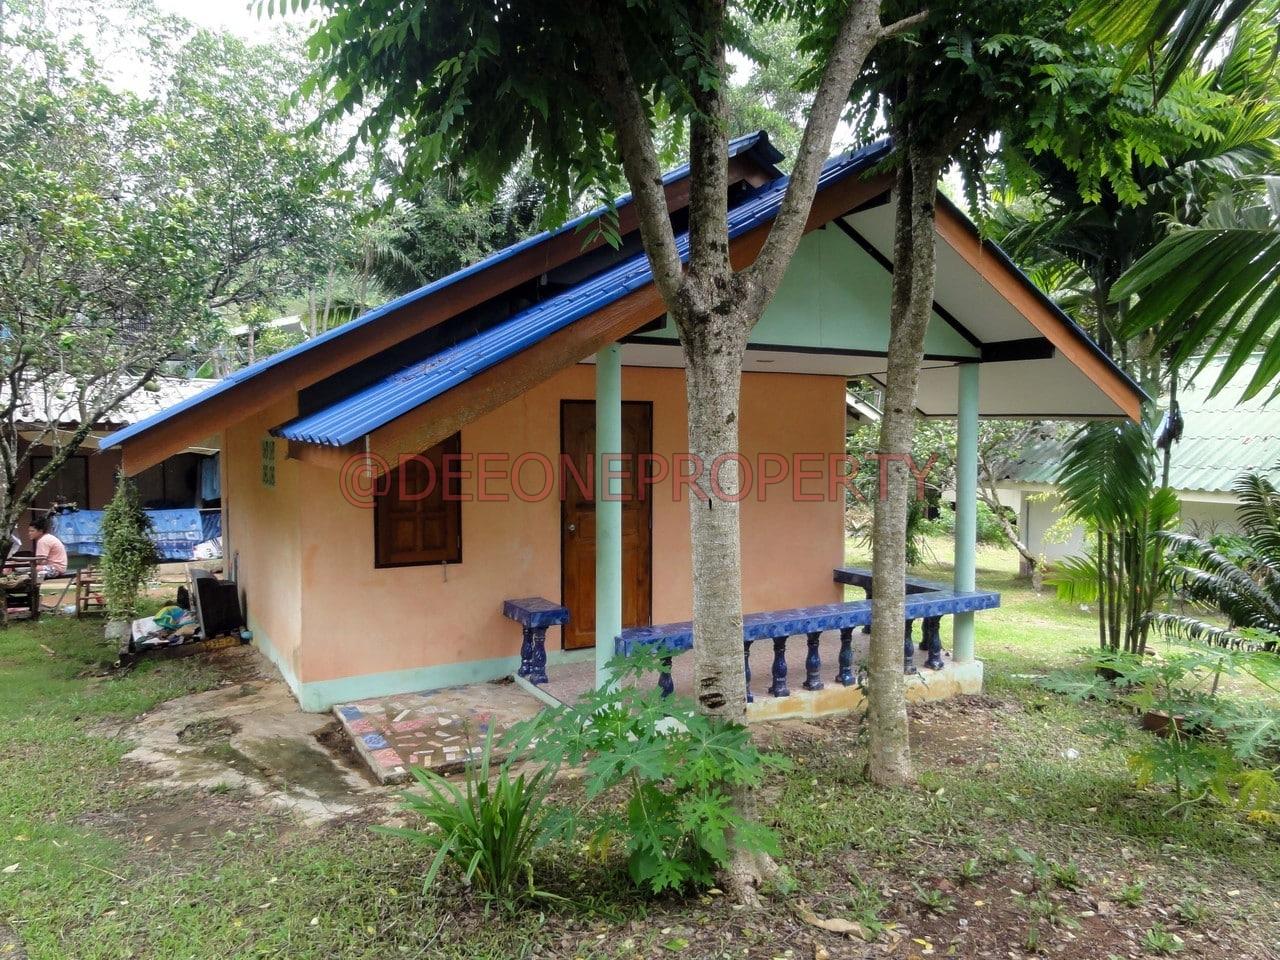 Garden Bungalow for Long Term stay – Bailan, Koh Chang